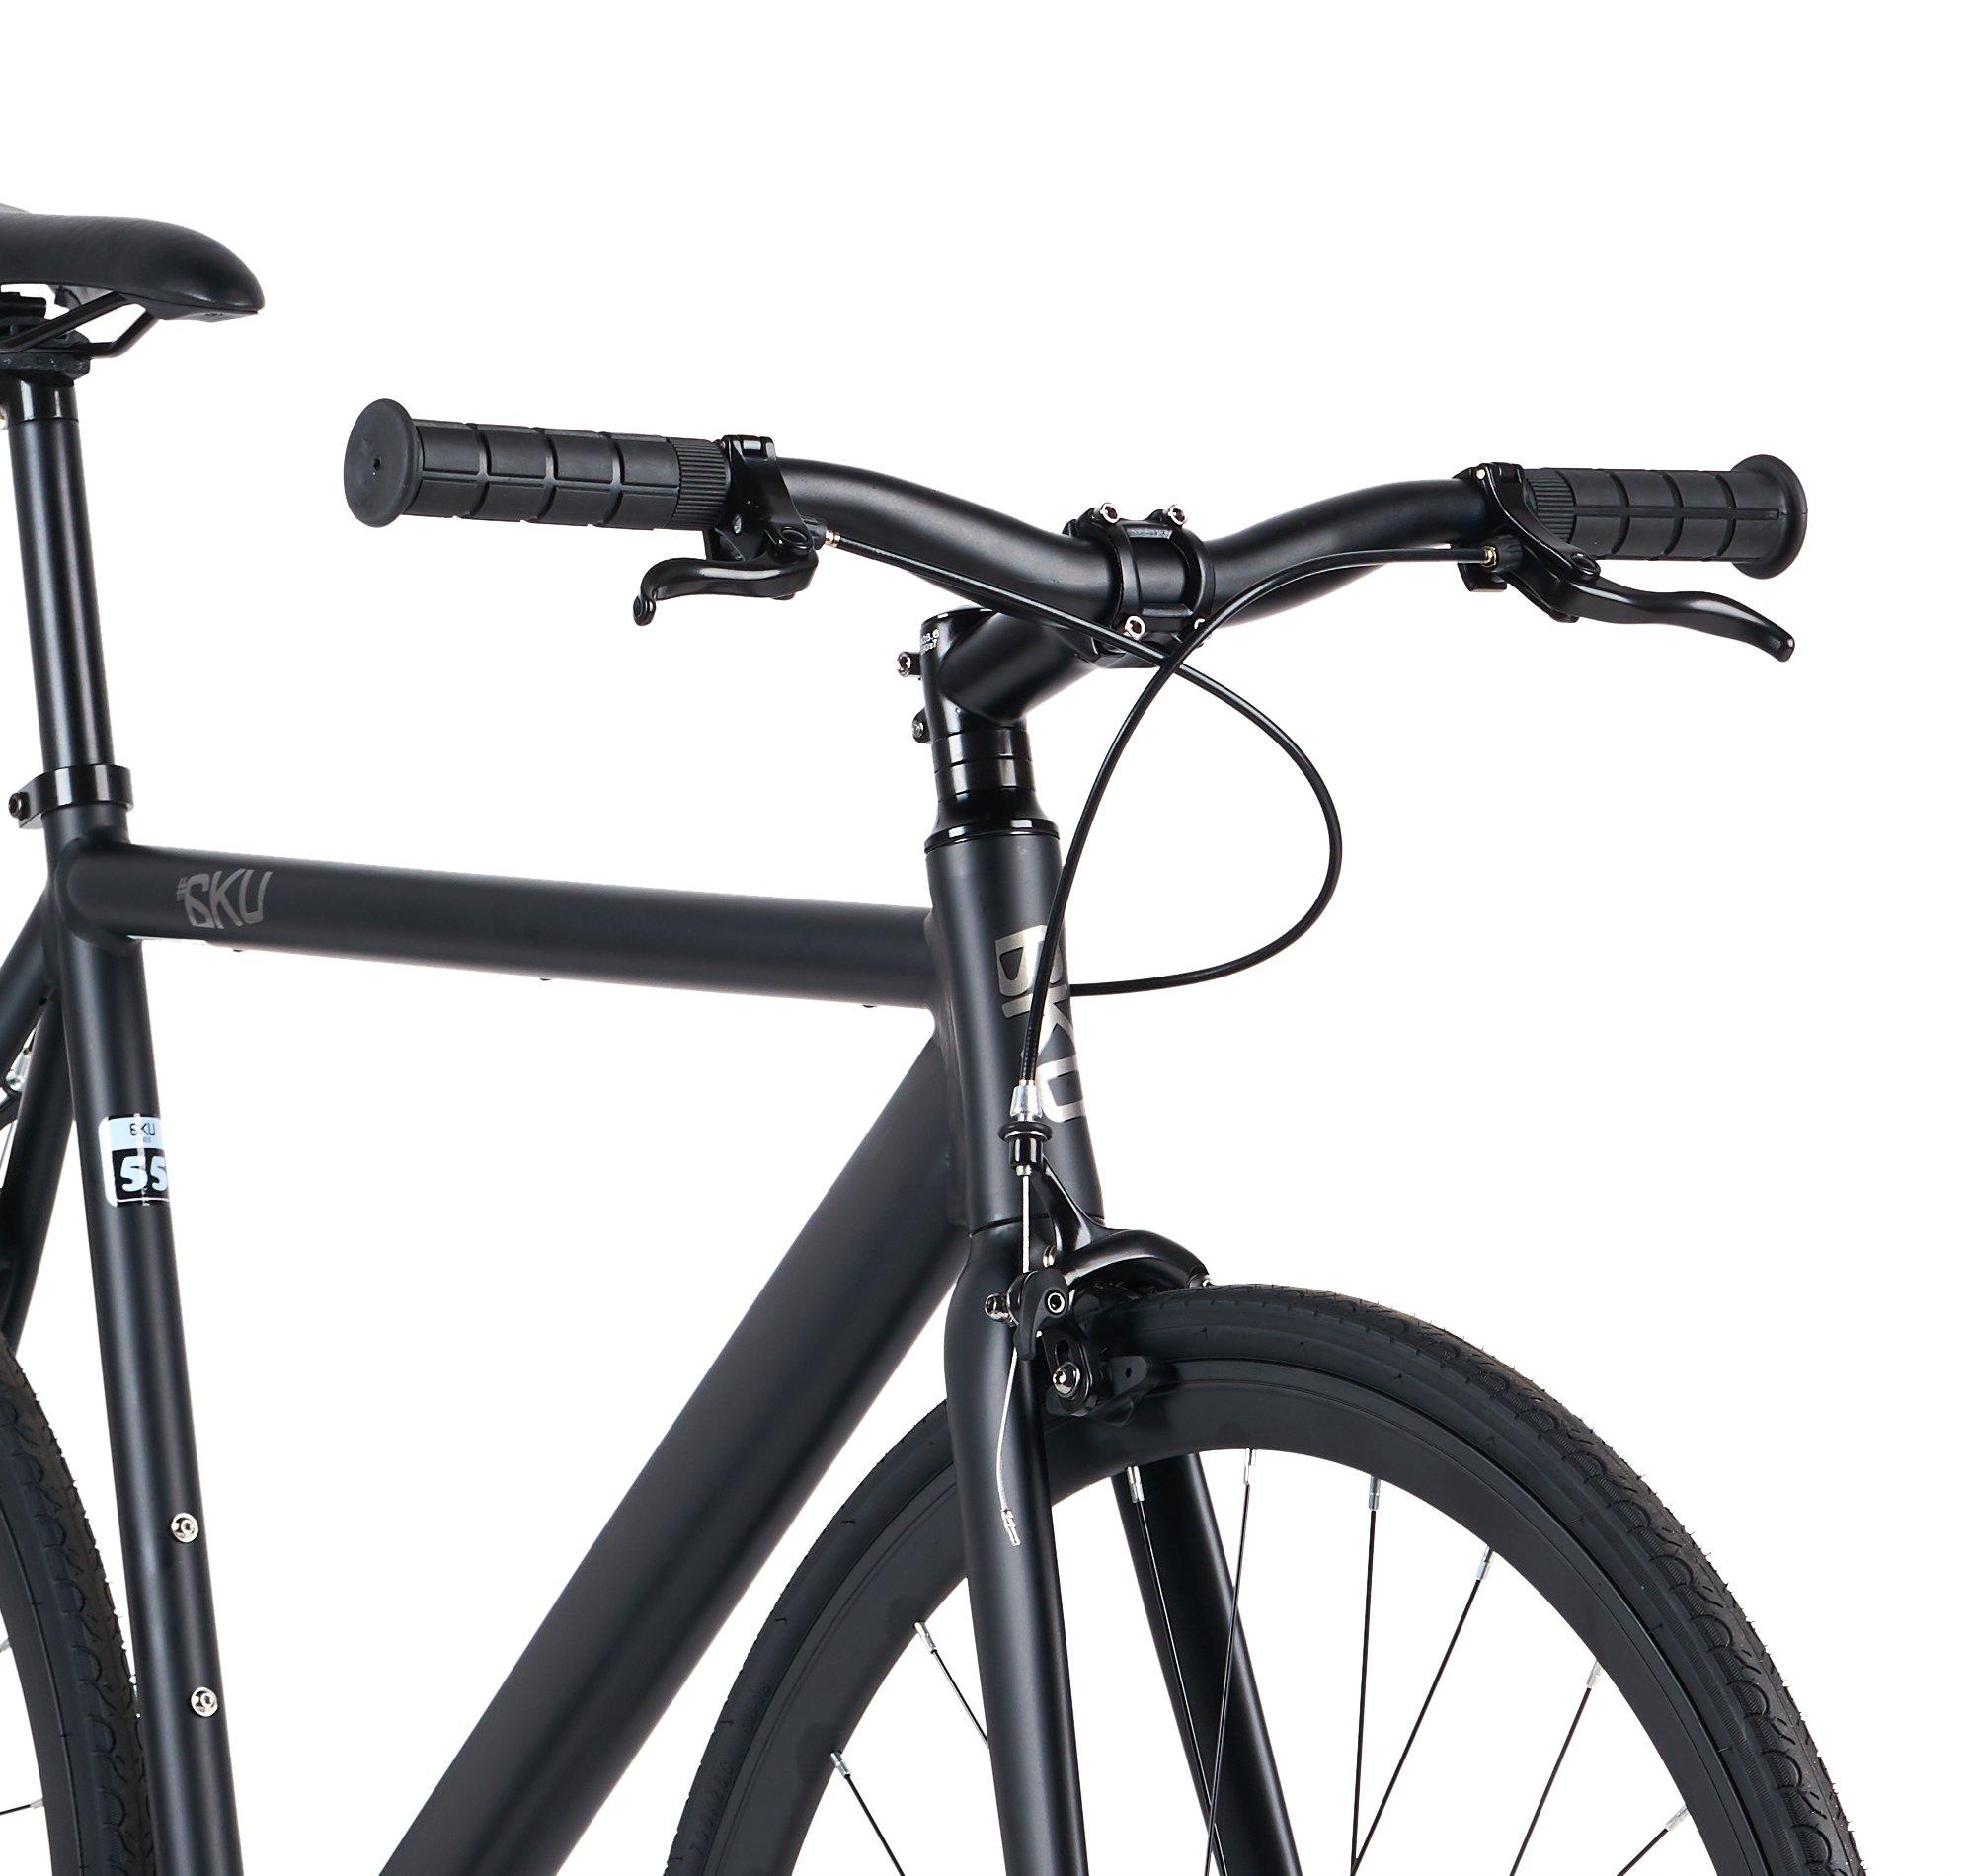 6ku Aluminum Fixed Gear Single Speed Fixie Urban Track Bike Edgar Bikes Us Shop